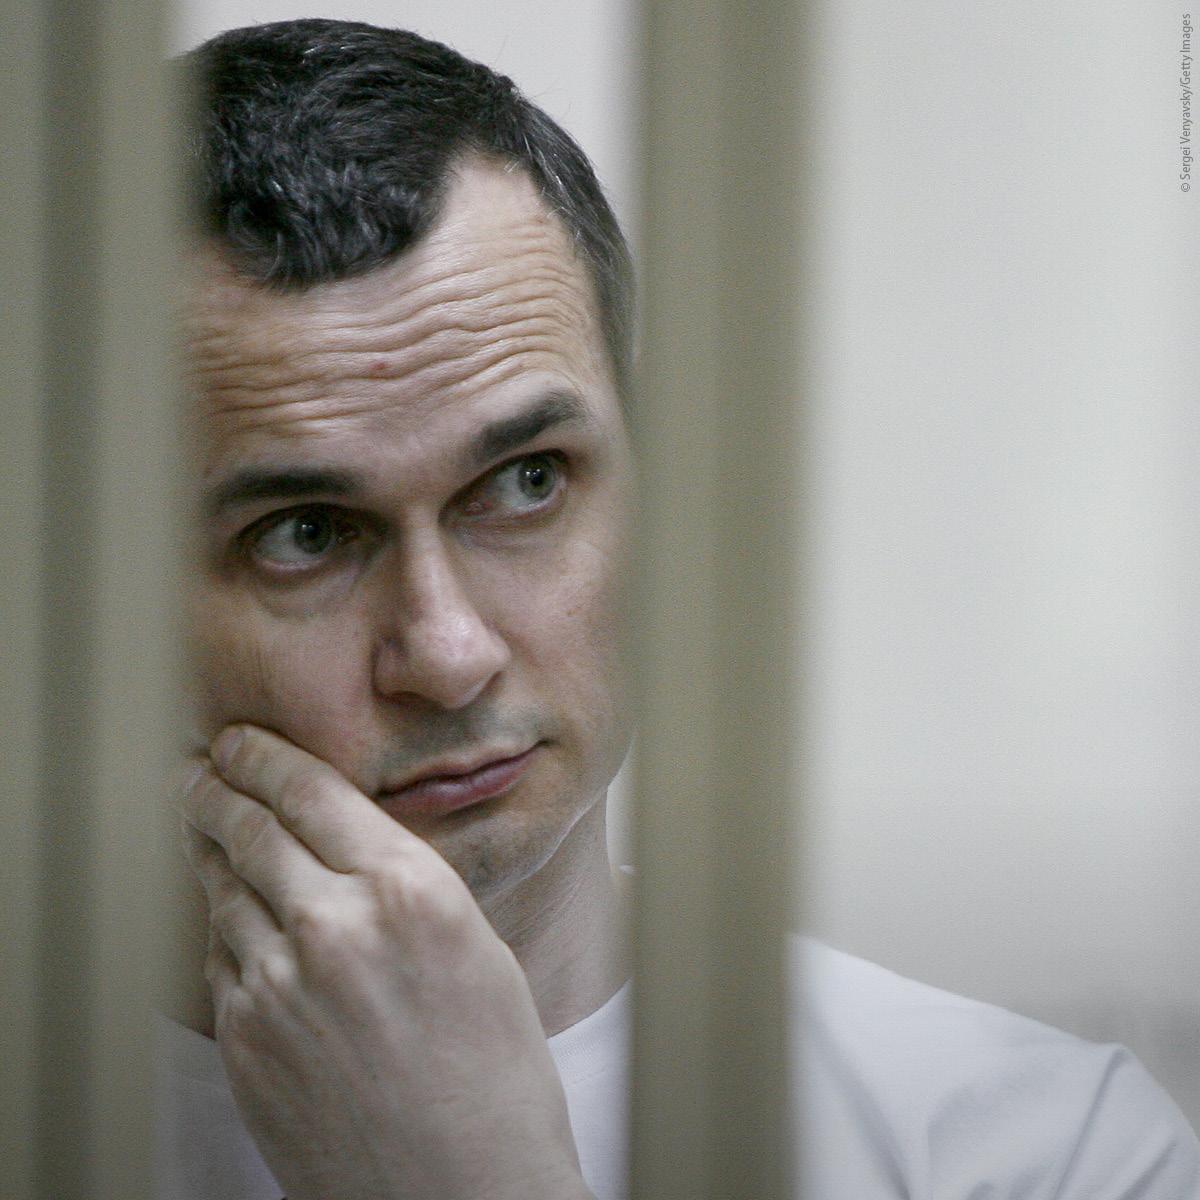 Sakharov Prize 2018 laureate Oleg Sentsov